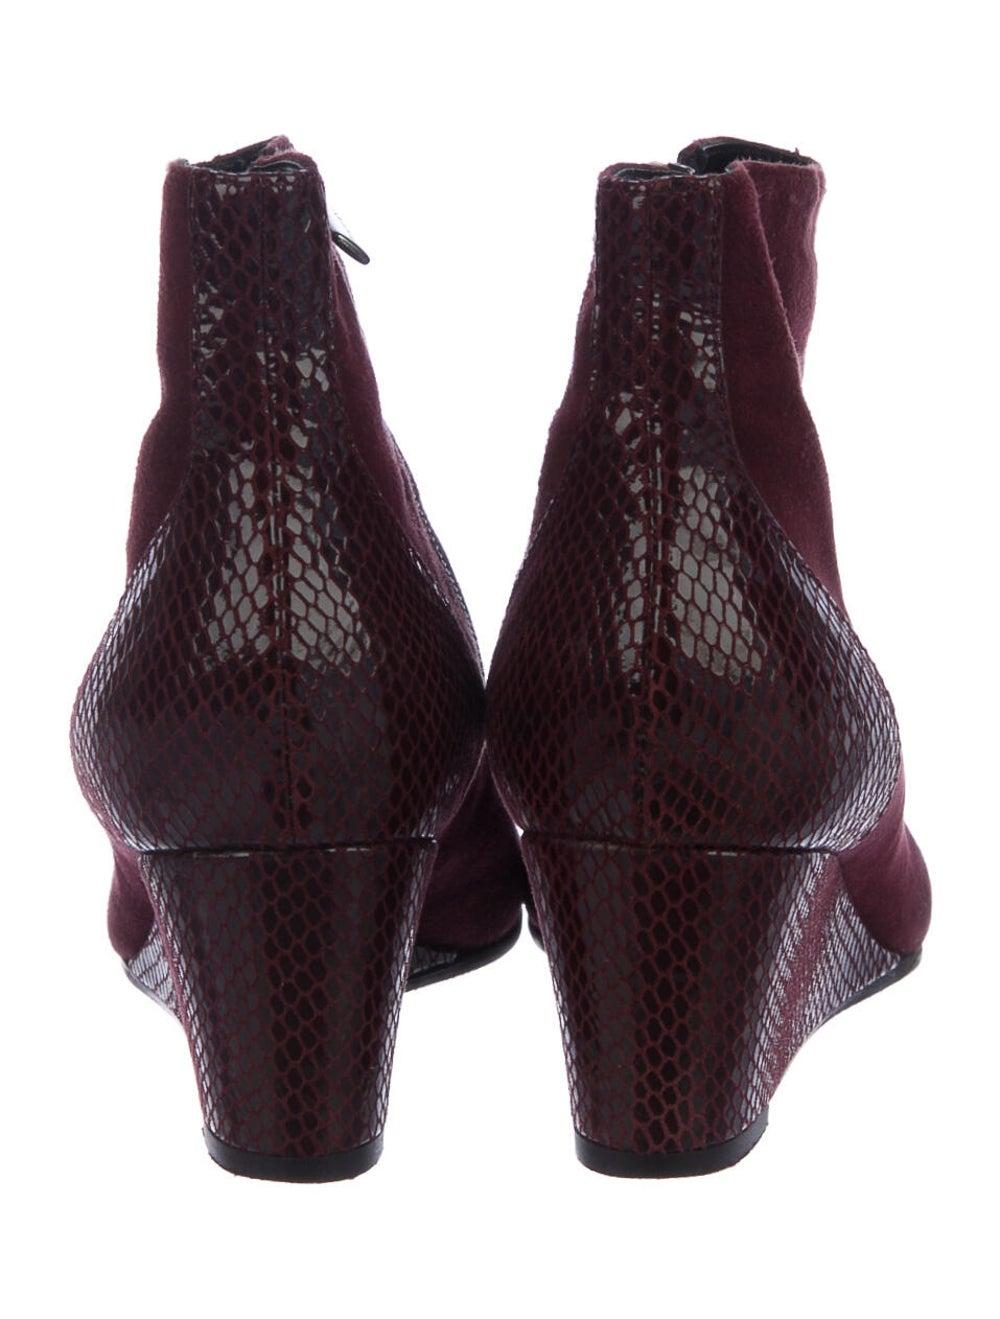 Aquatalia Embossed Suede Boots Red - image 3